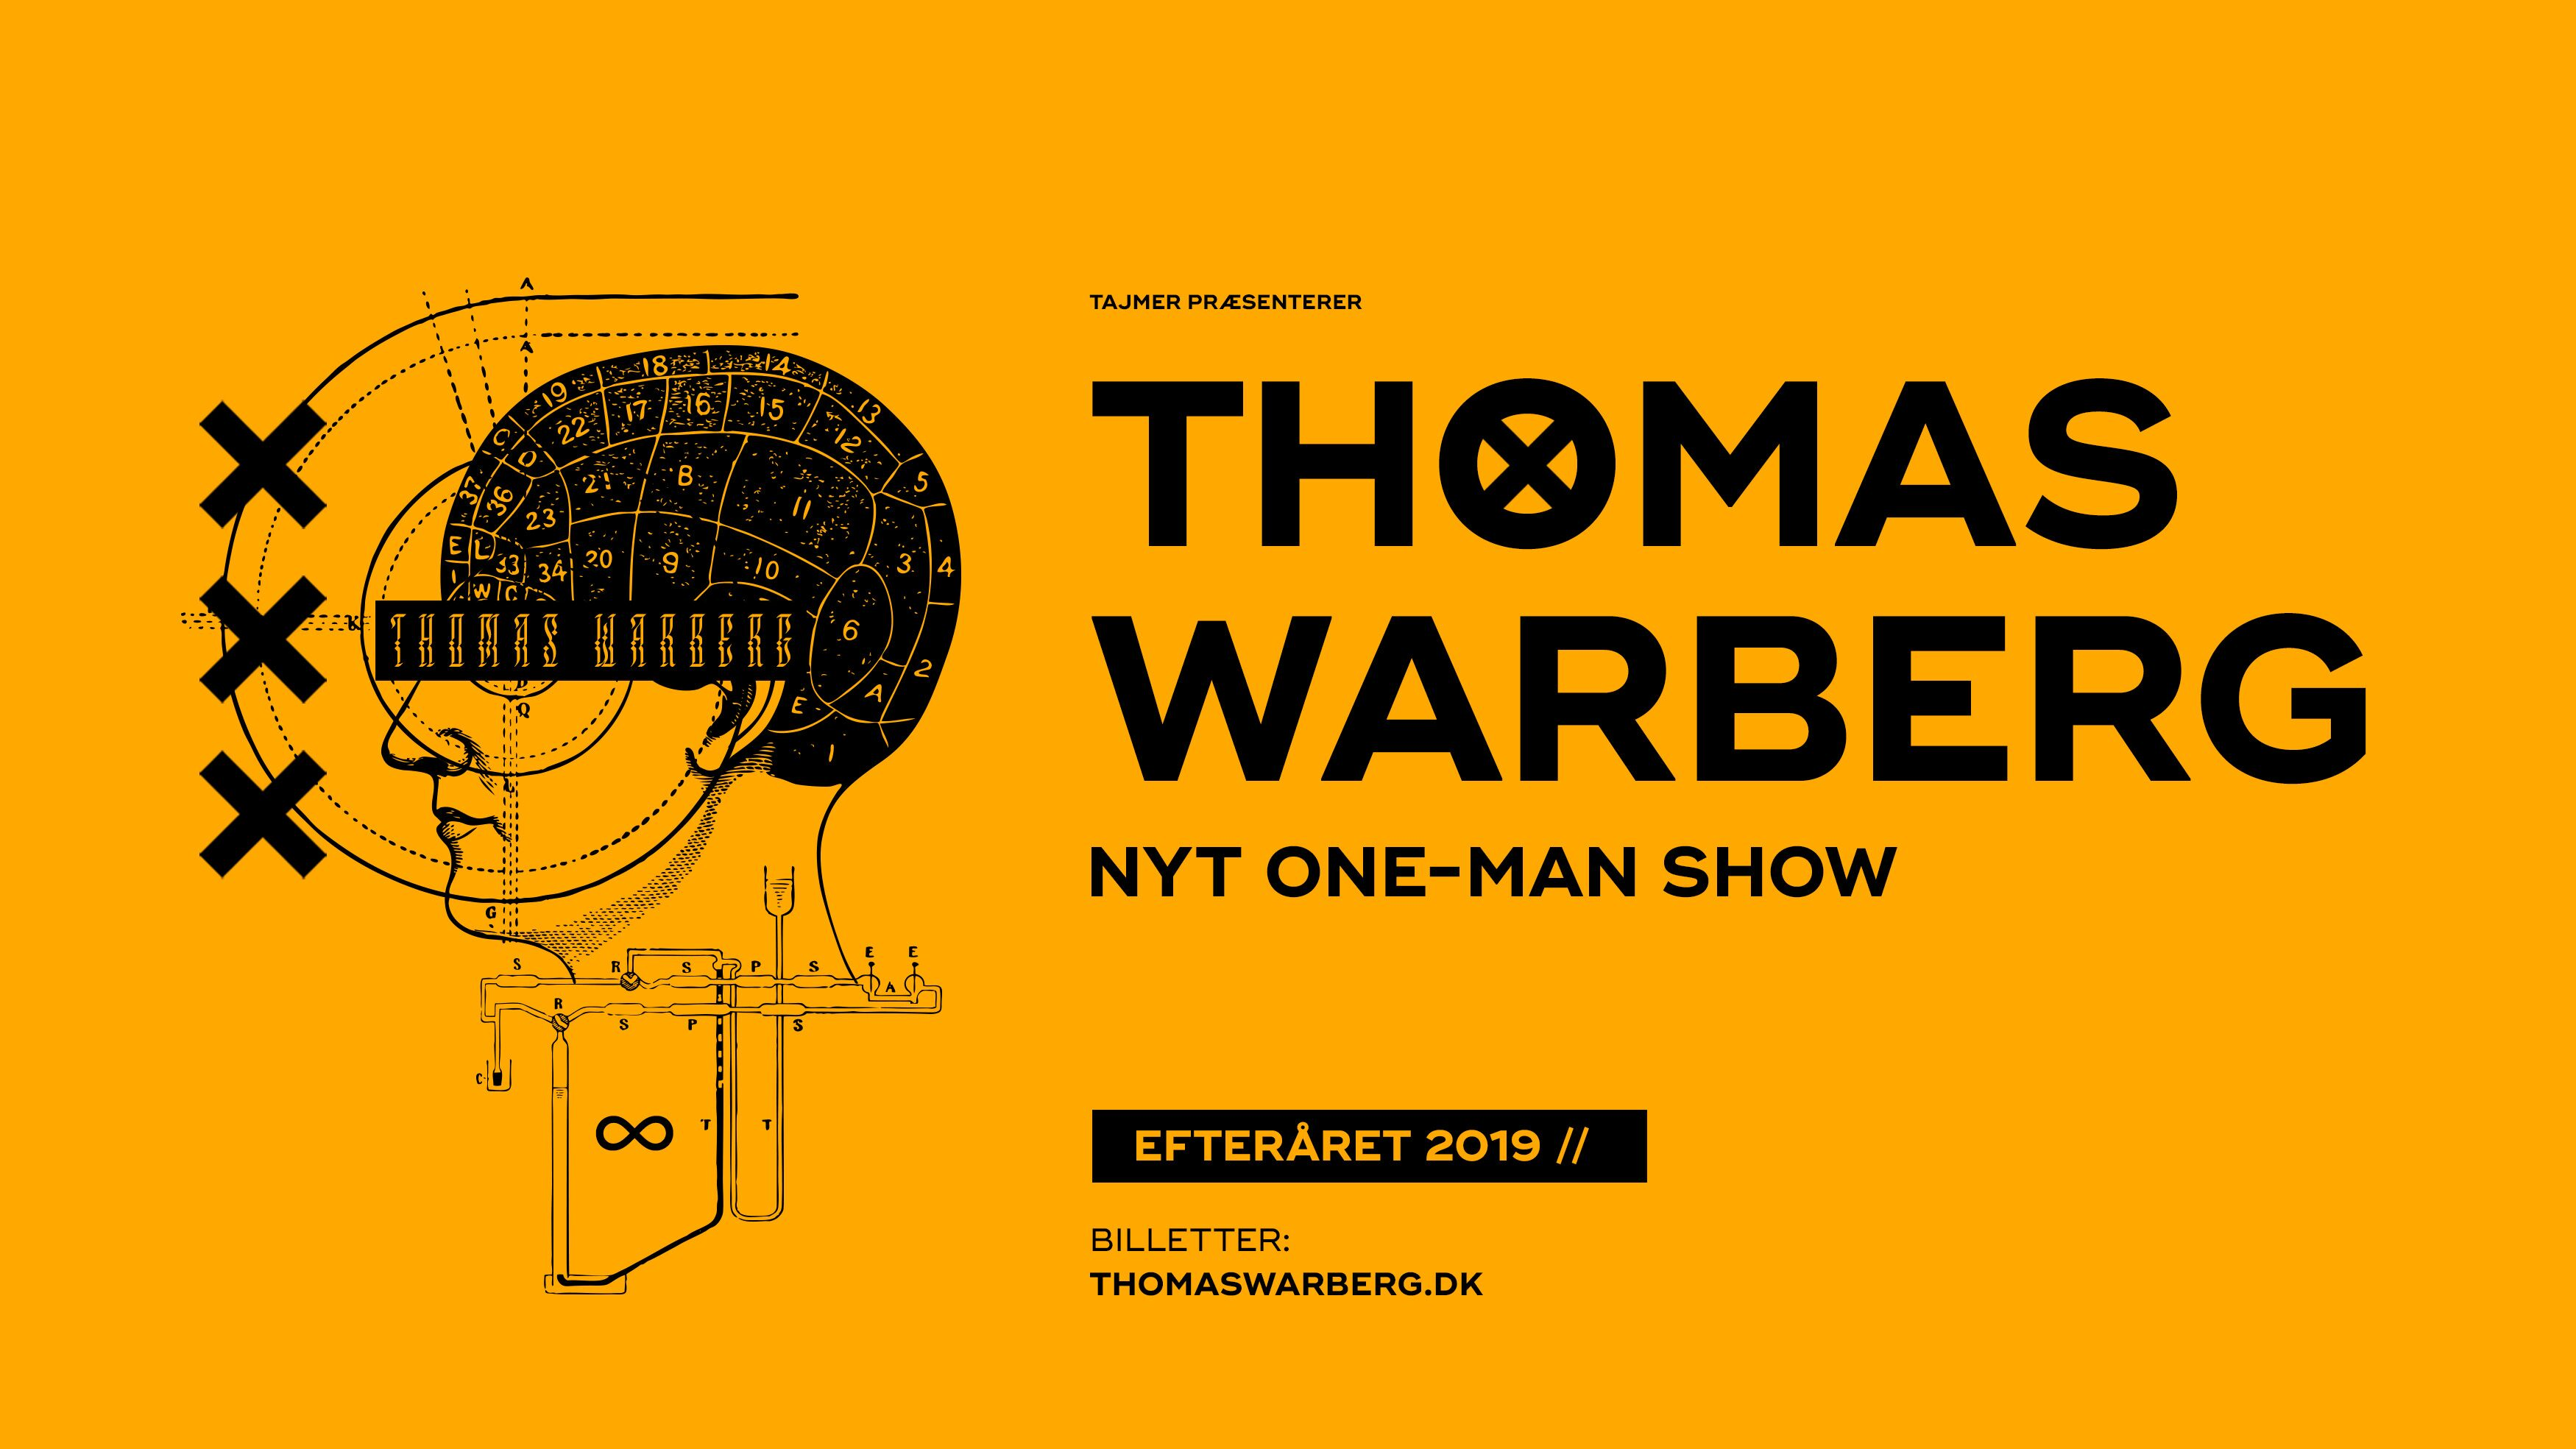 Thomas Warberg